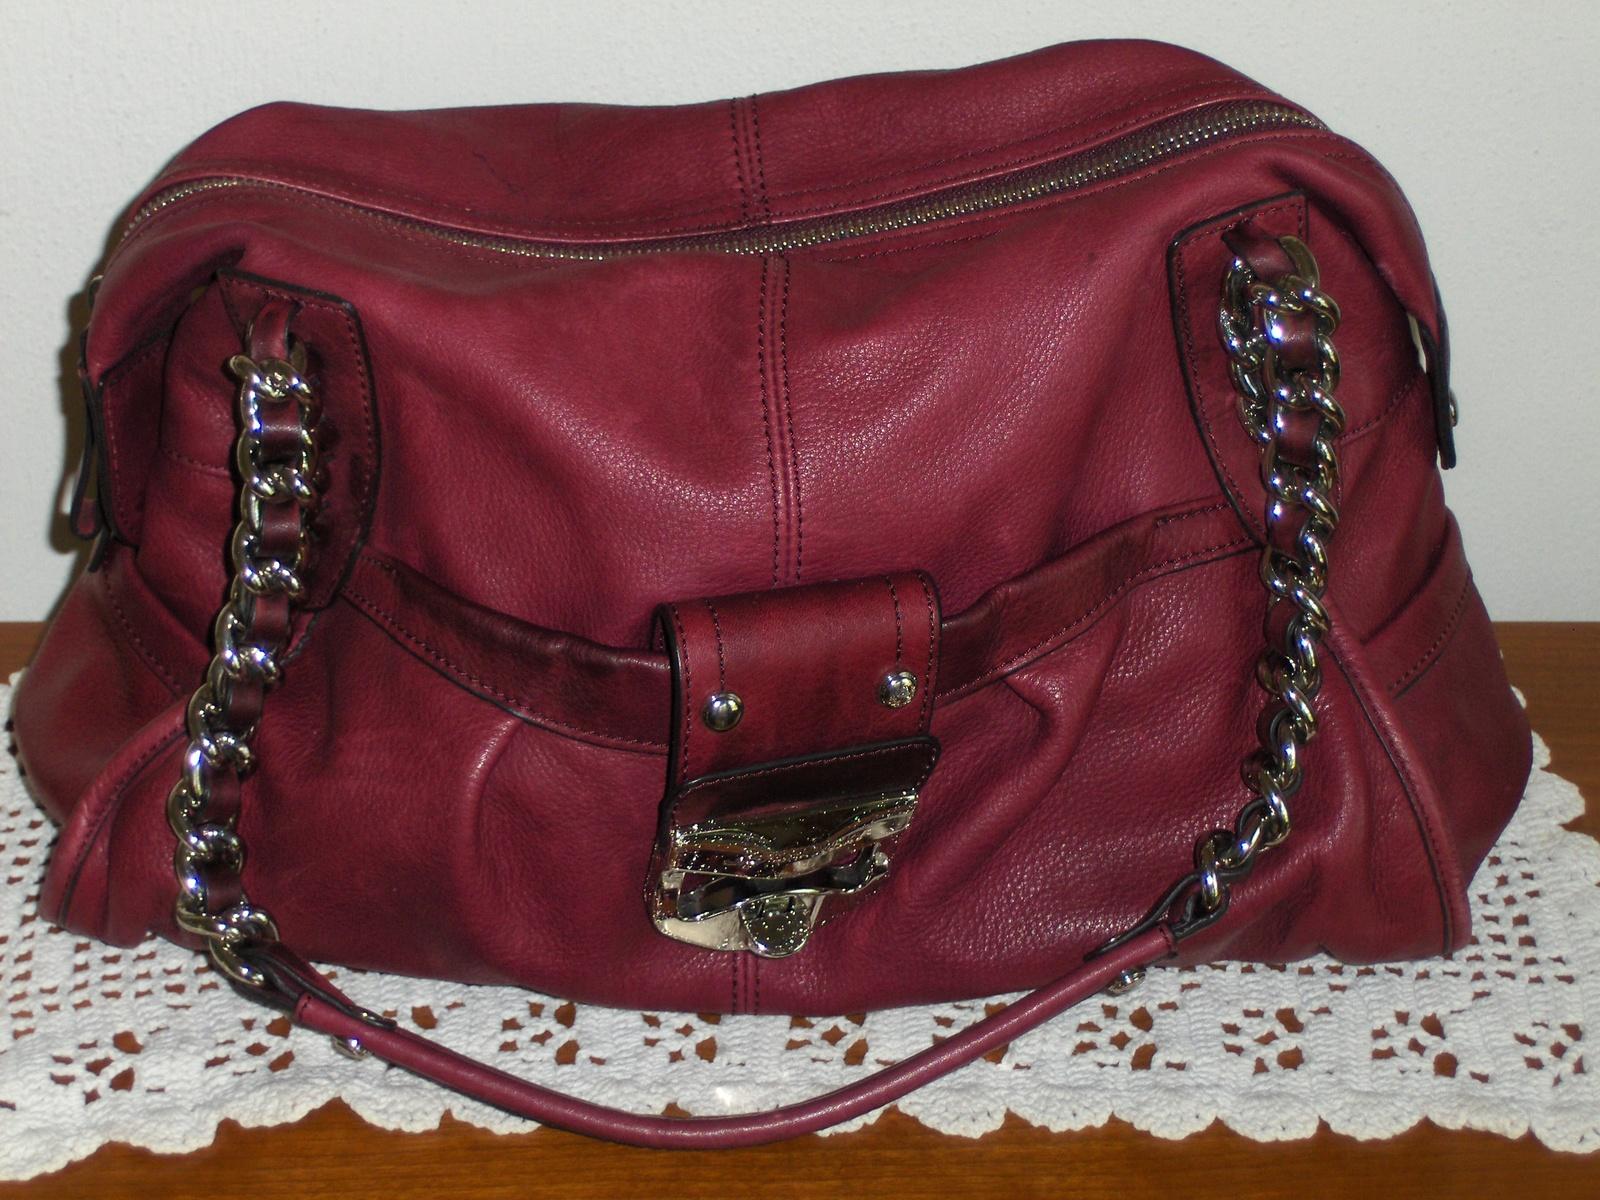 aa49681691d572 B. Makowsky Satchel Cranberry Leather and 50 similar items